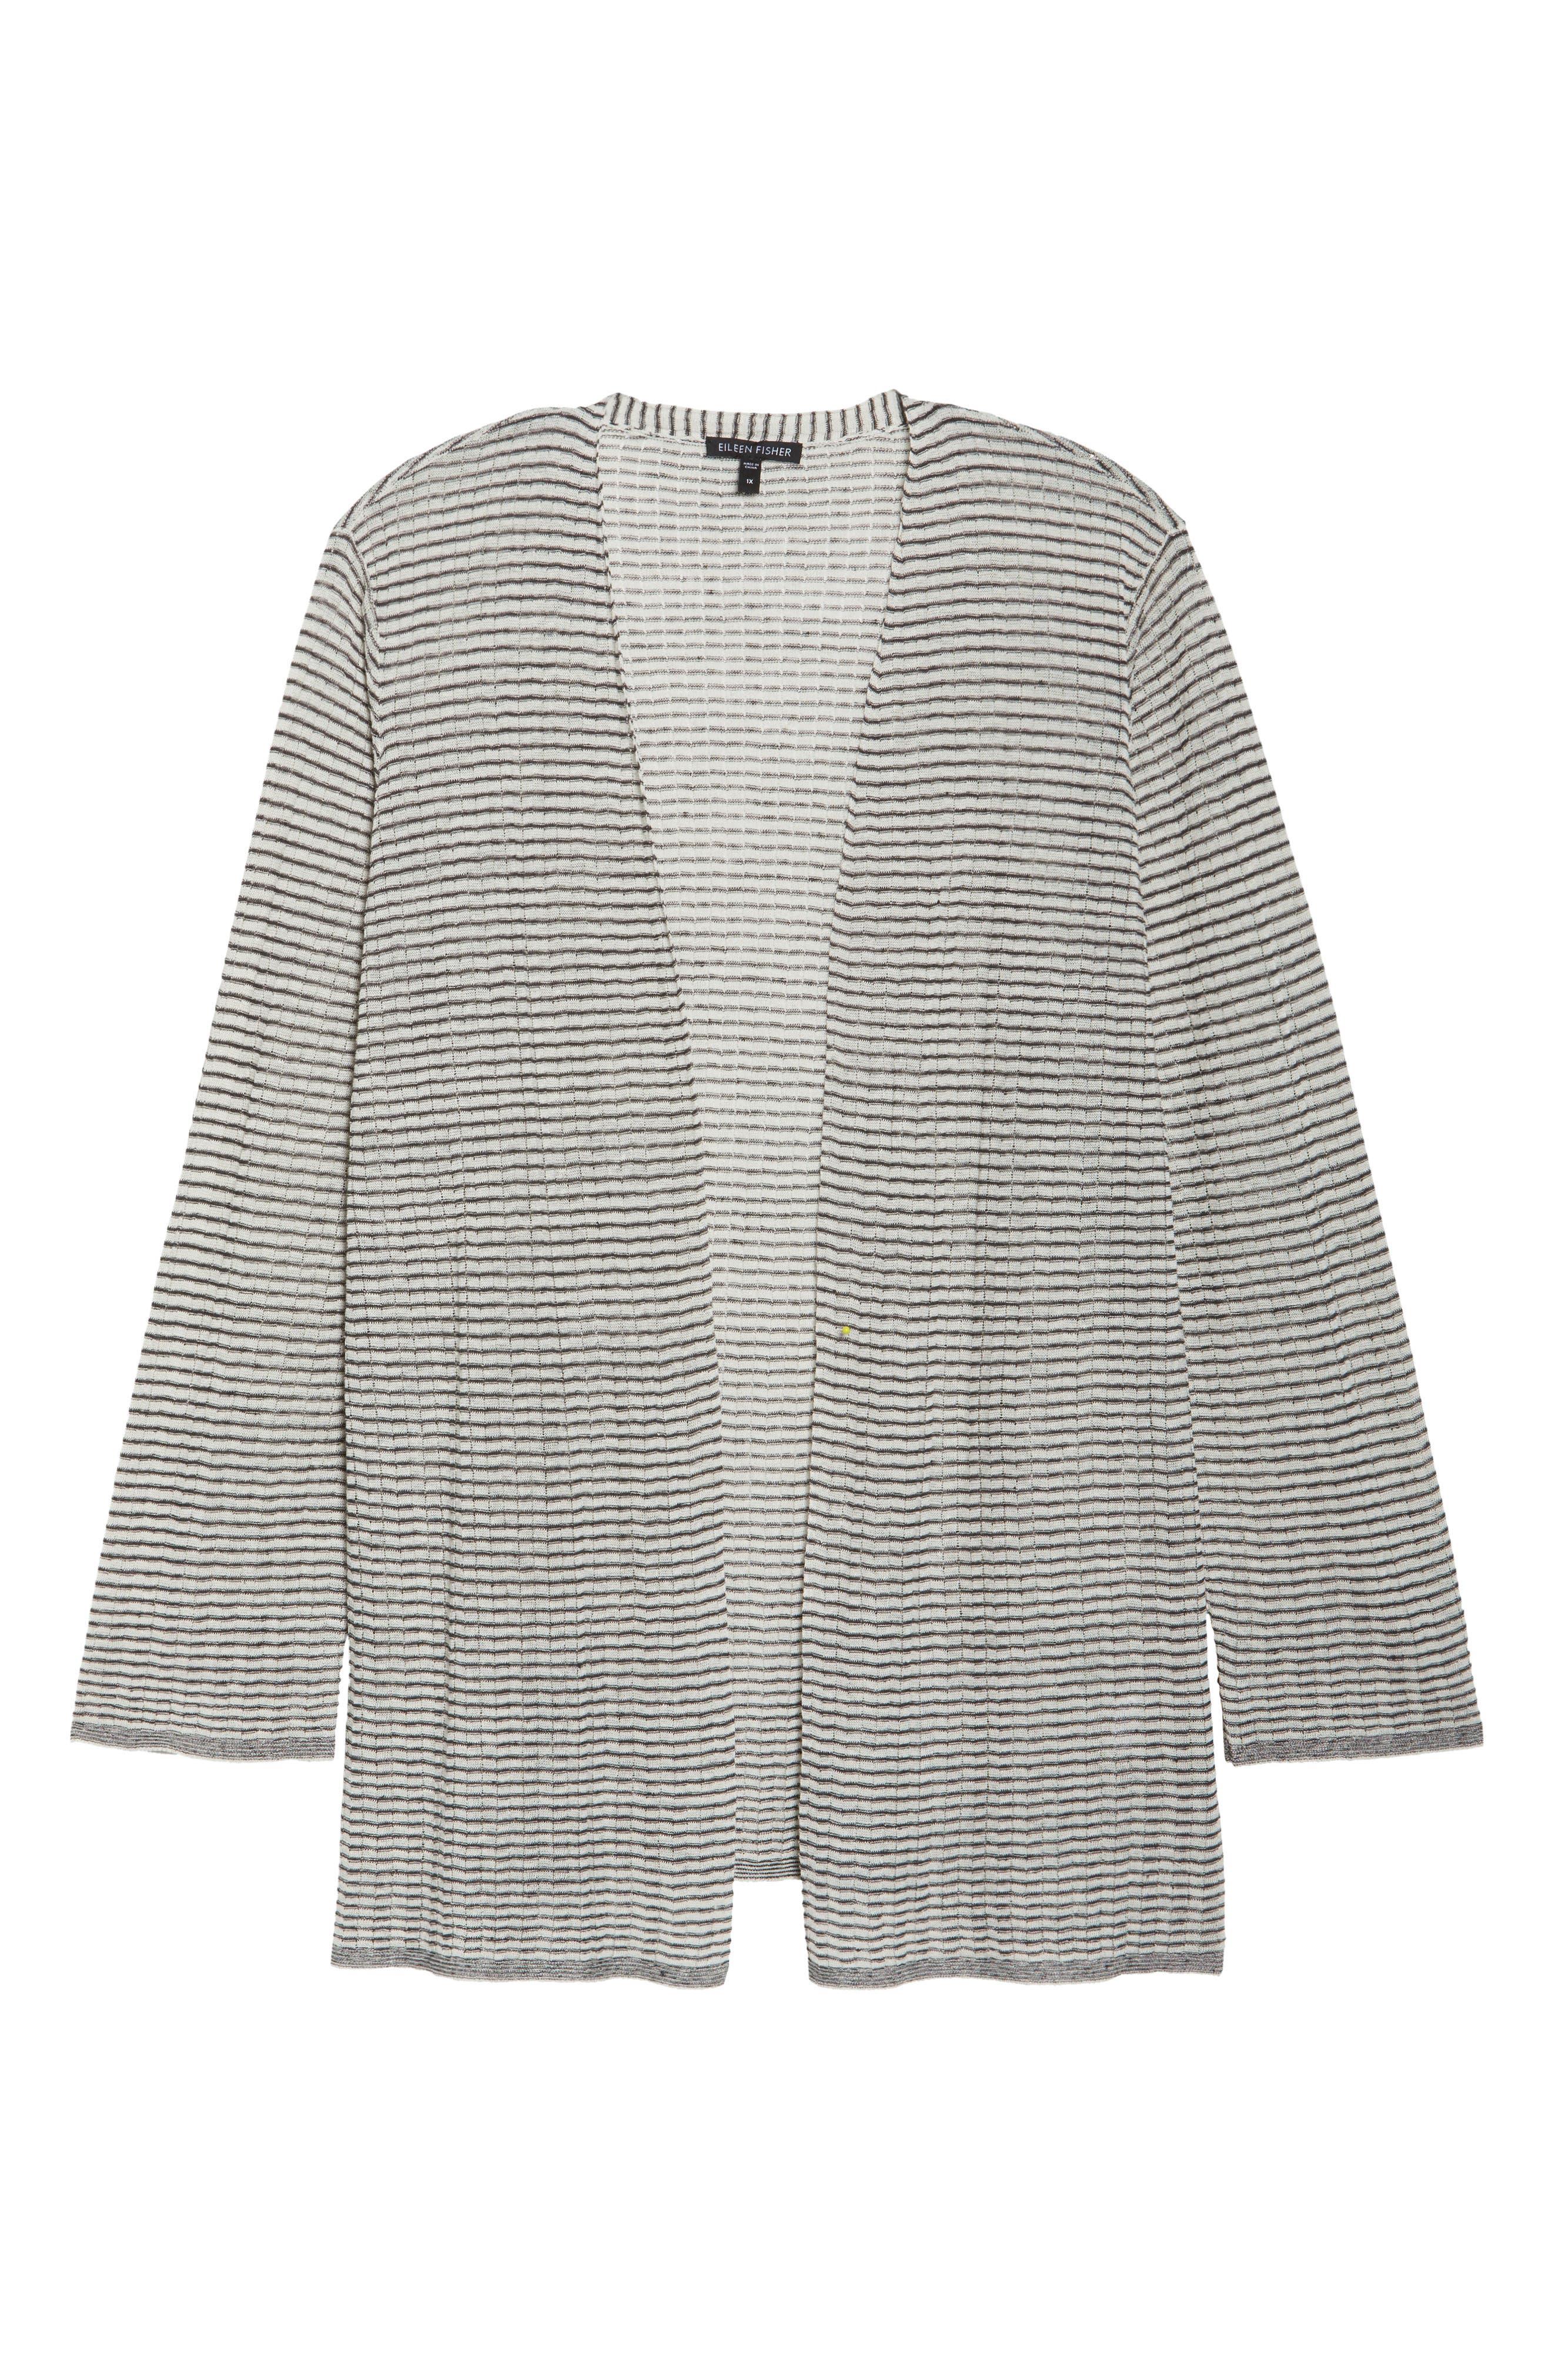 Simple Stripe Linen Blend Cardigan,                             Alternate thumbnail 6, color,                             Graphite/ Bone